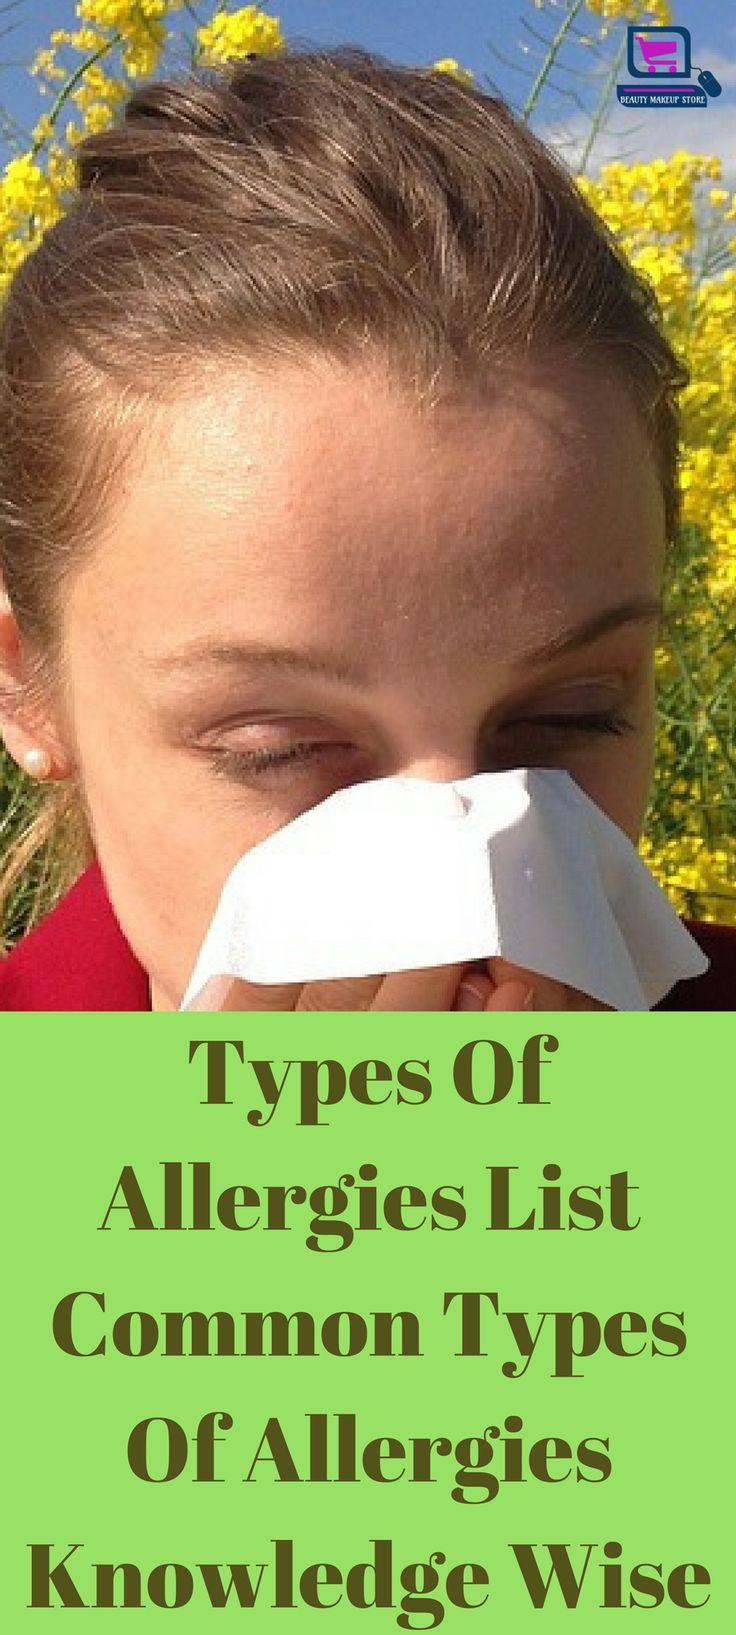 Types Of Allergies List – Common Types Of Allergies Knowledge Wise #typesofallergies #allergy #allergylist #foodallergy #allergiesremedies #allergiesingrass allergies remedies | allergies | allergies funny | allergies humor | allergies essential oils | EBL Food Allergies | Kids With Food Allergies | Allergies | Allergies, Asthma, Colds, and Flu | Allergies & Eczema | Allergies |